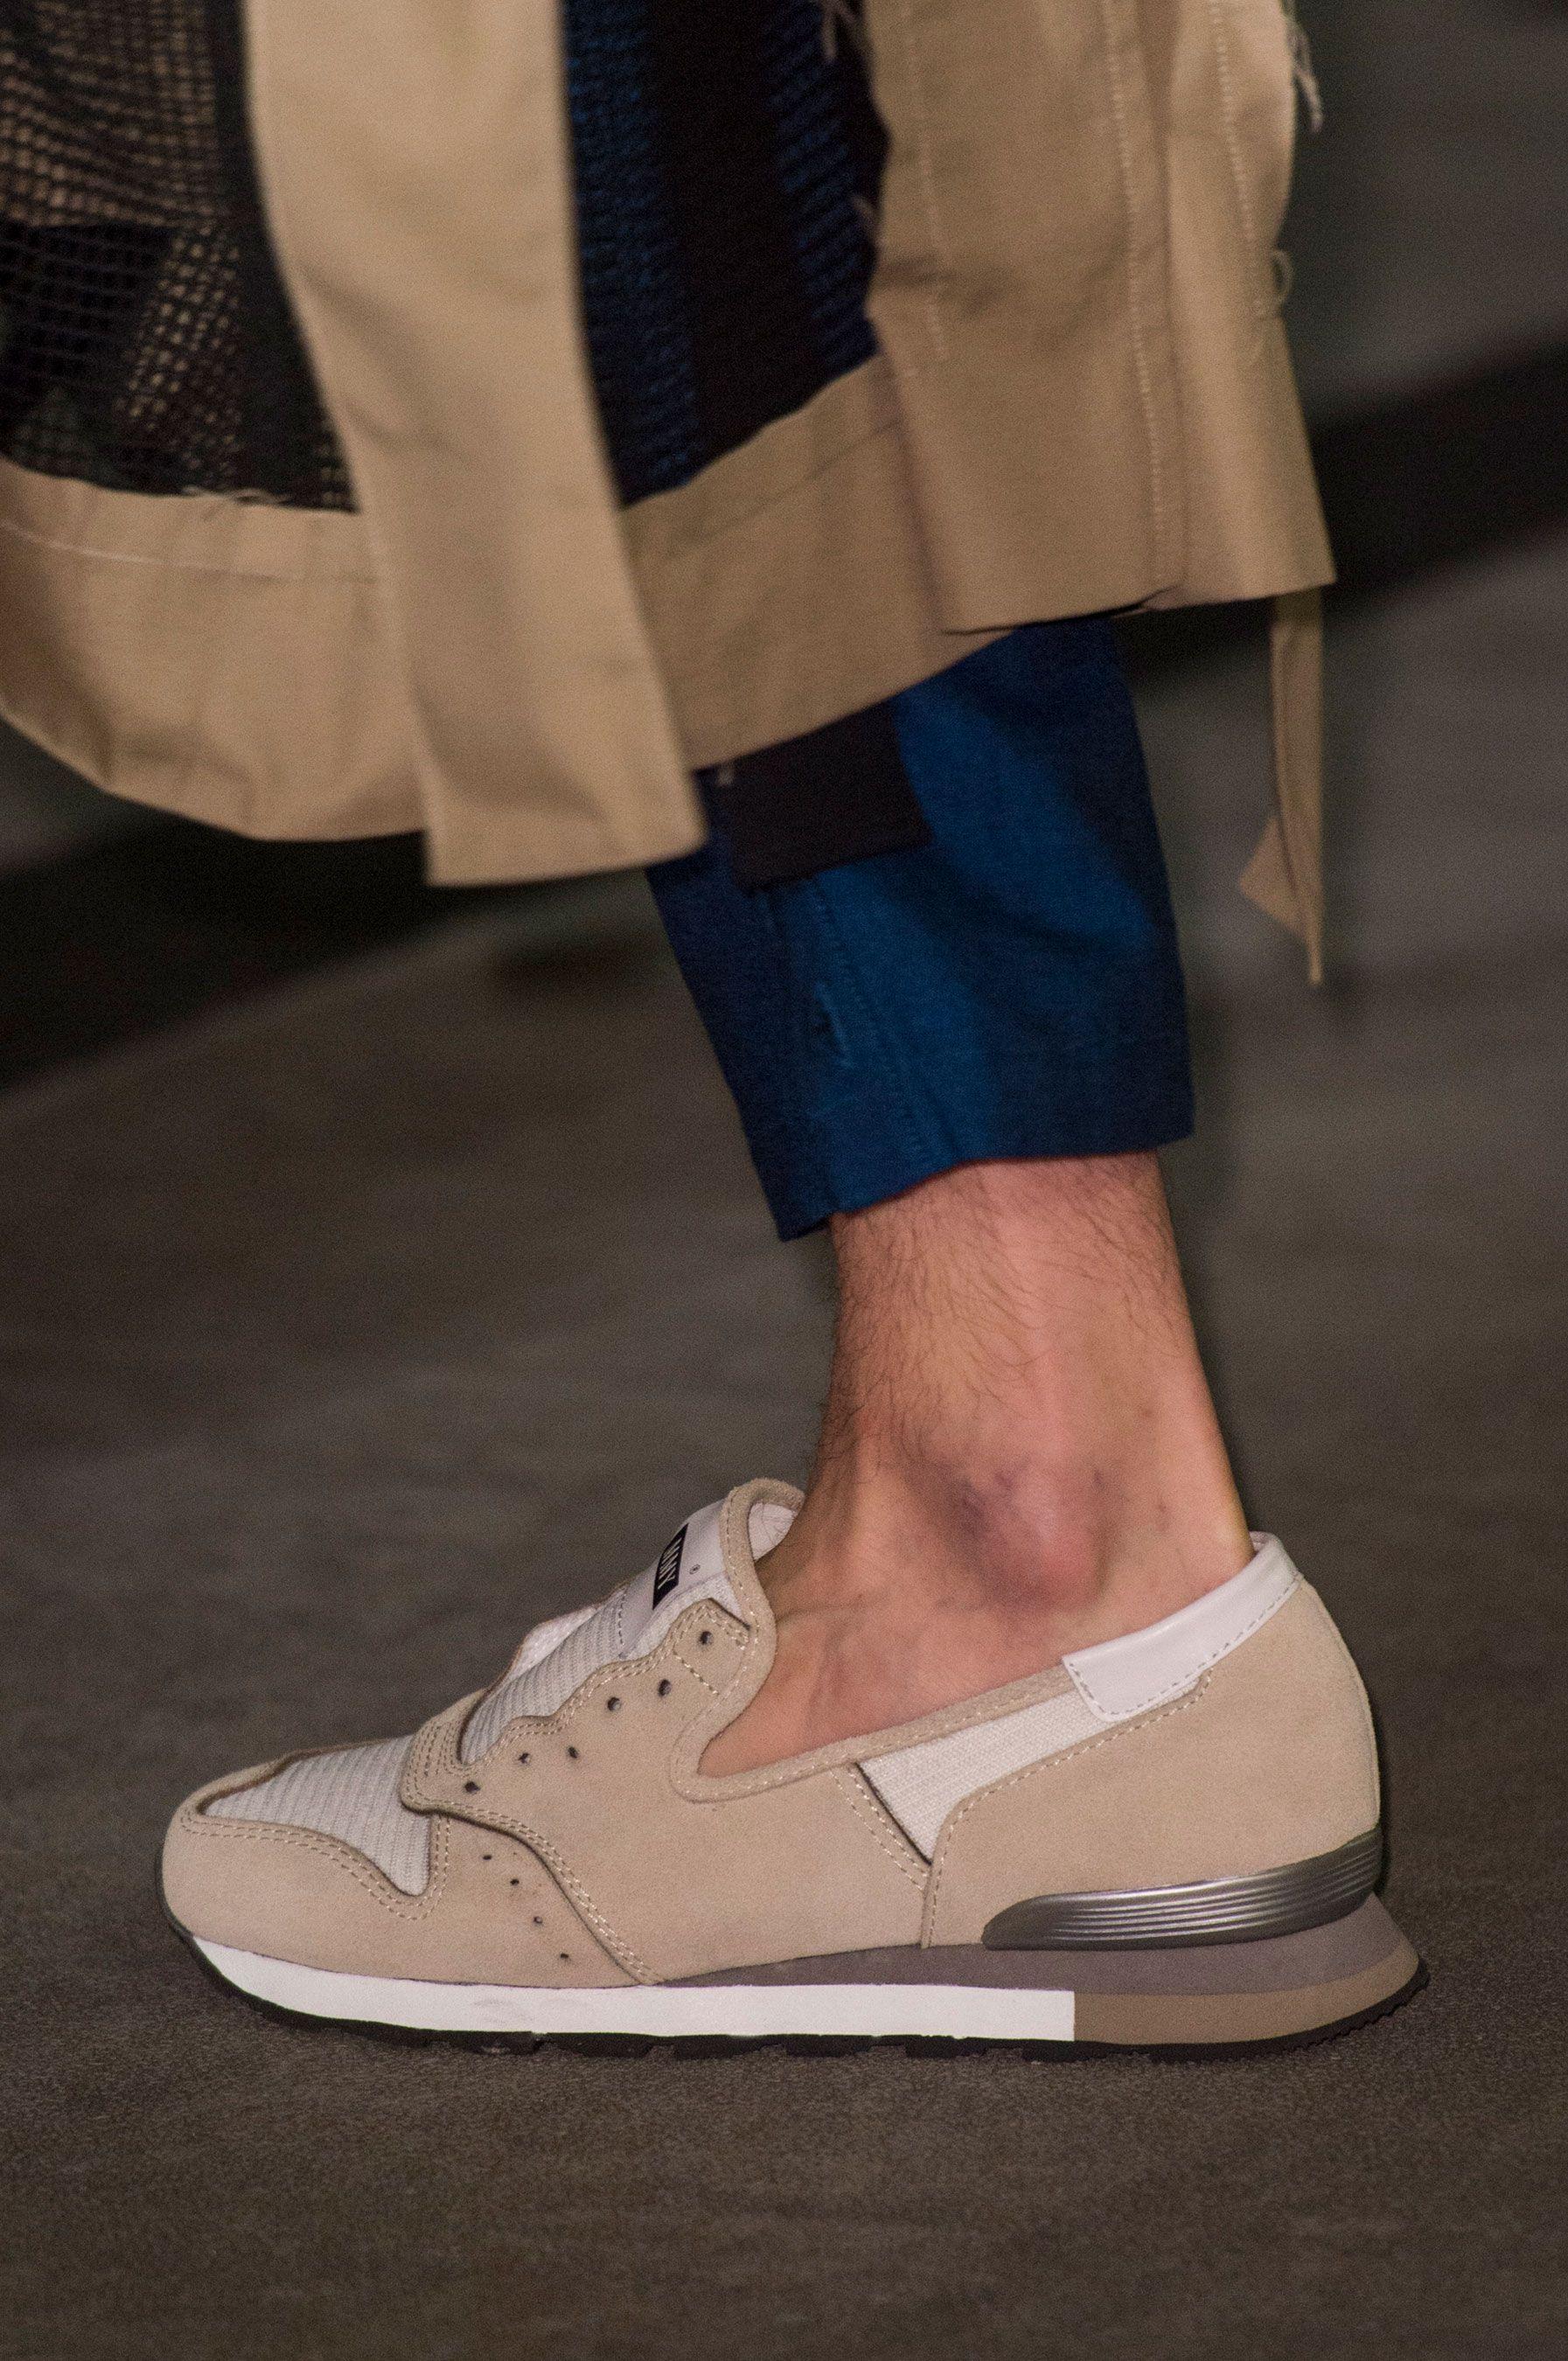 Maison Mihara Yasuhiro Spring 2018 Men s Fashion Show Details - The  Impression Zapatillas De Cuero 755bcfd47